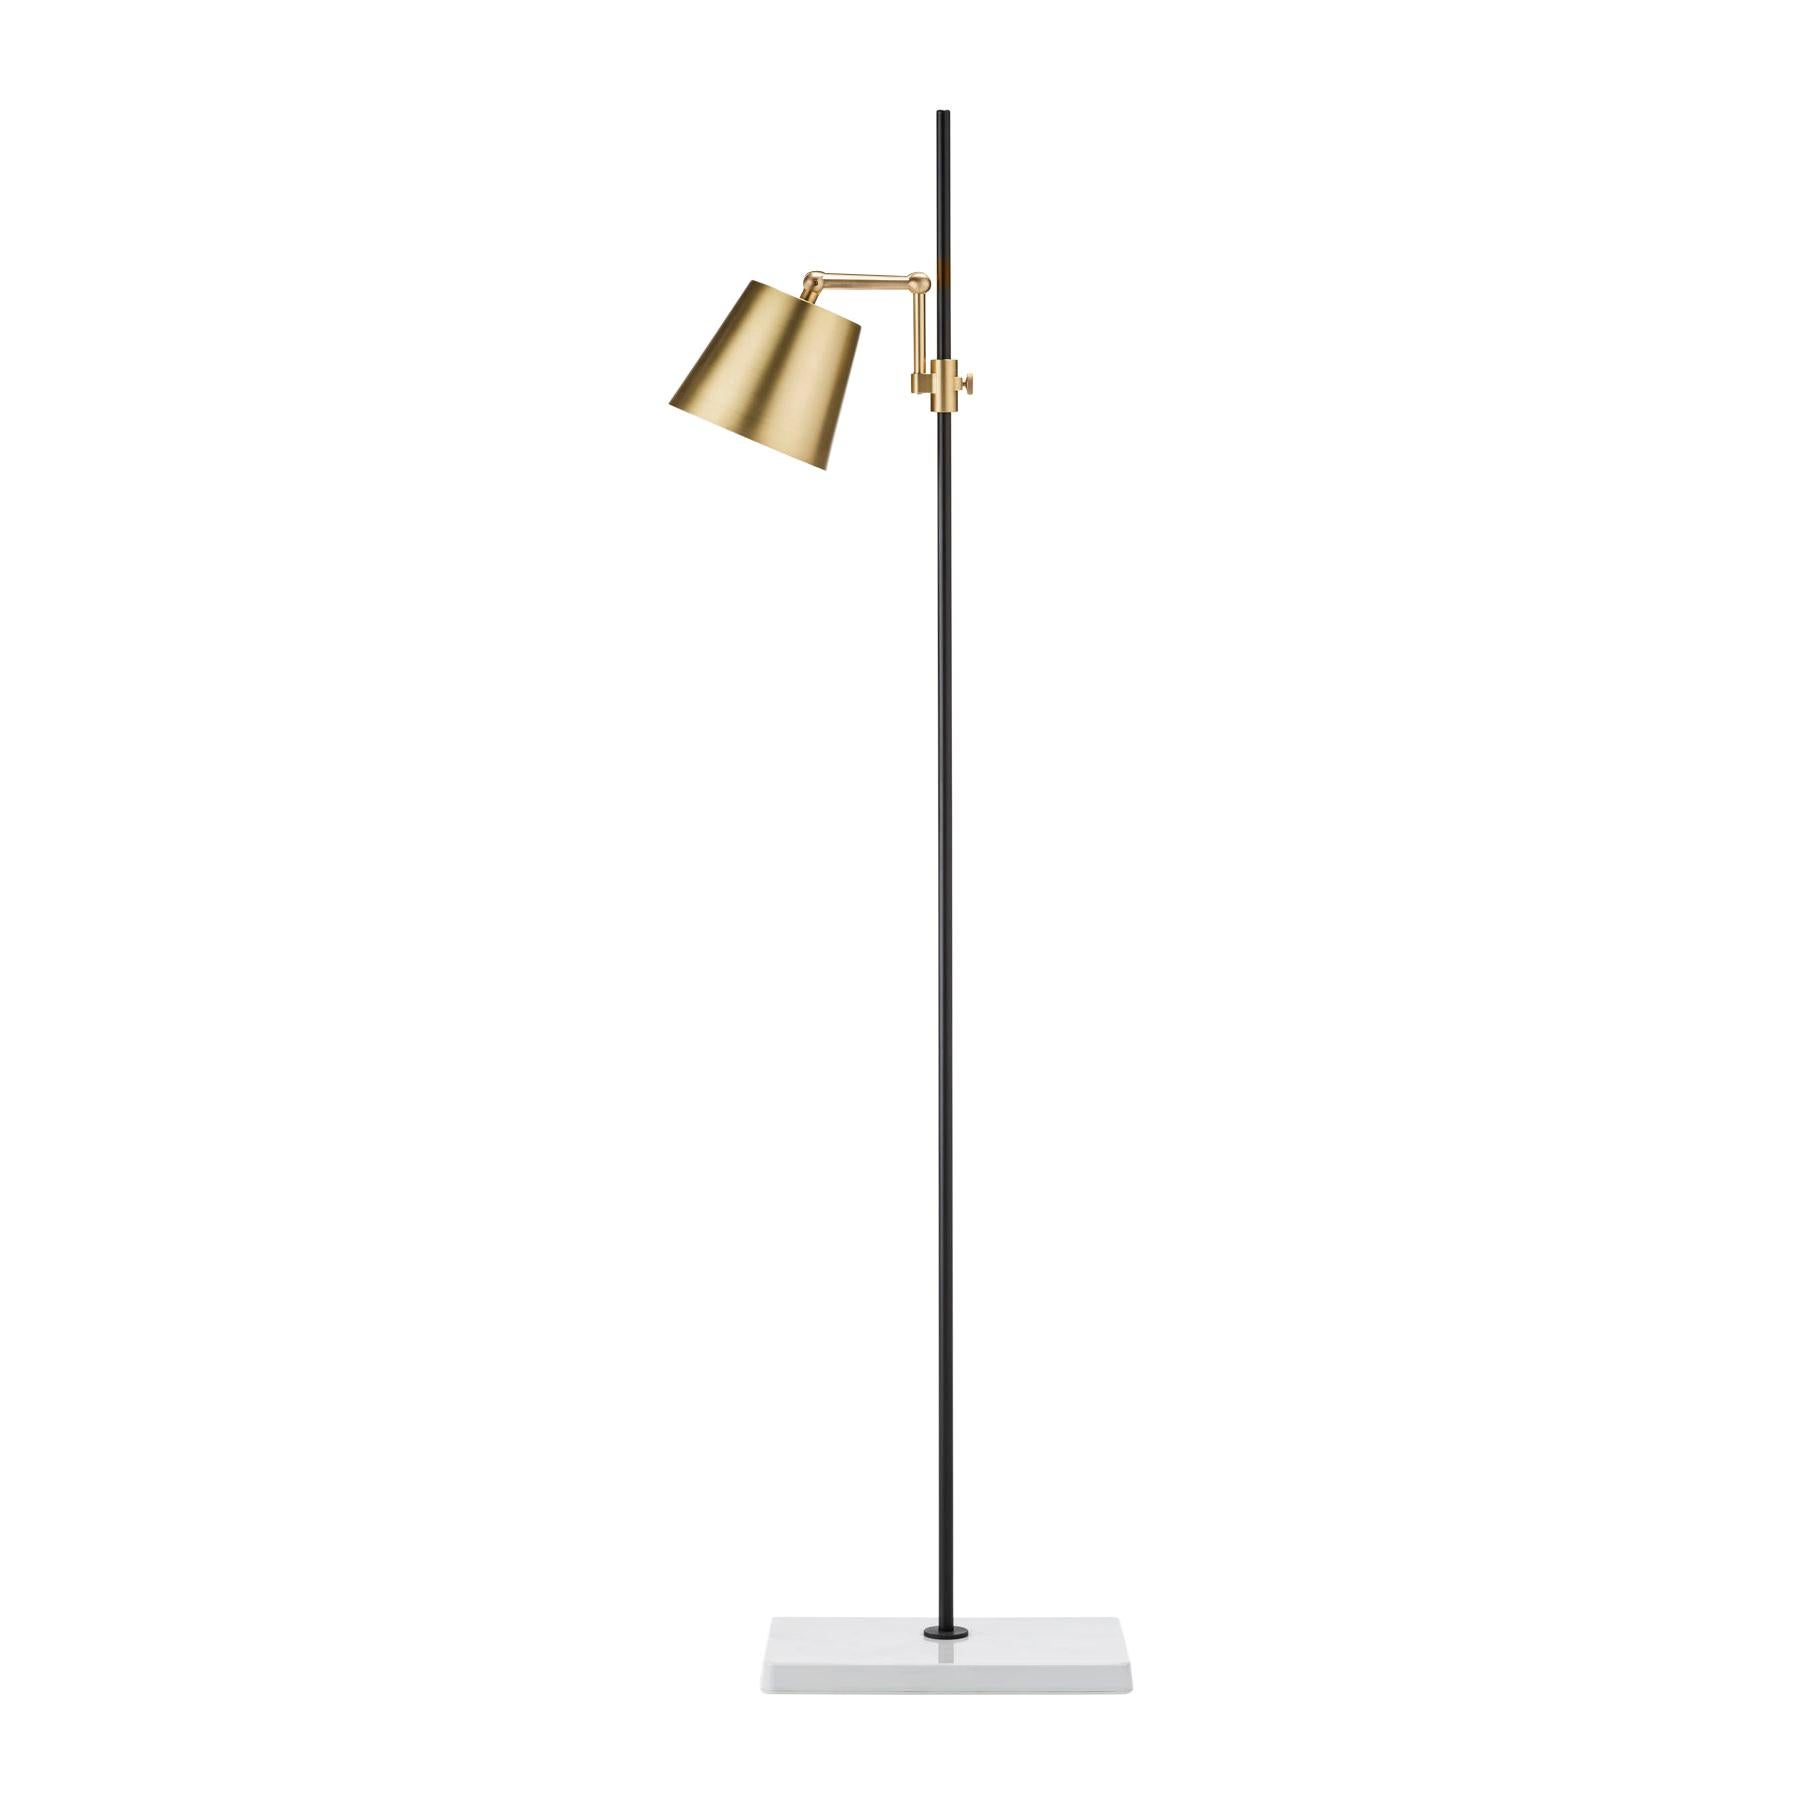 Anatomy Design 'Lab Light Floor' Brass, Porcelain and Steel Floor Lamp